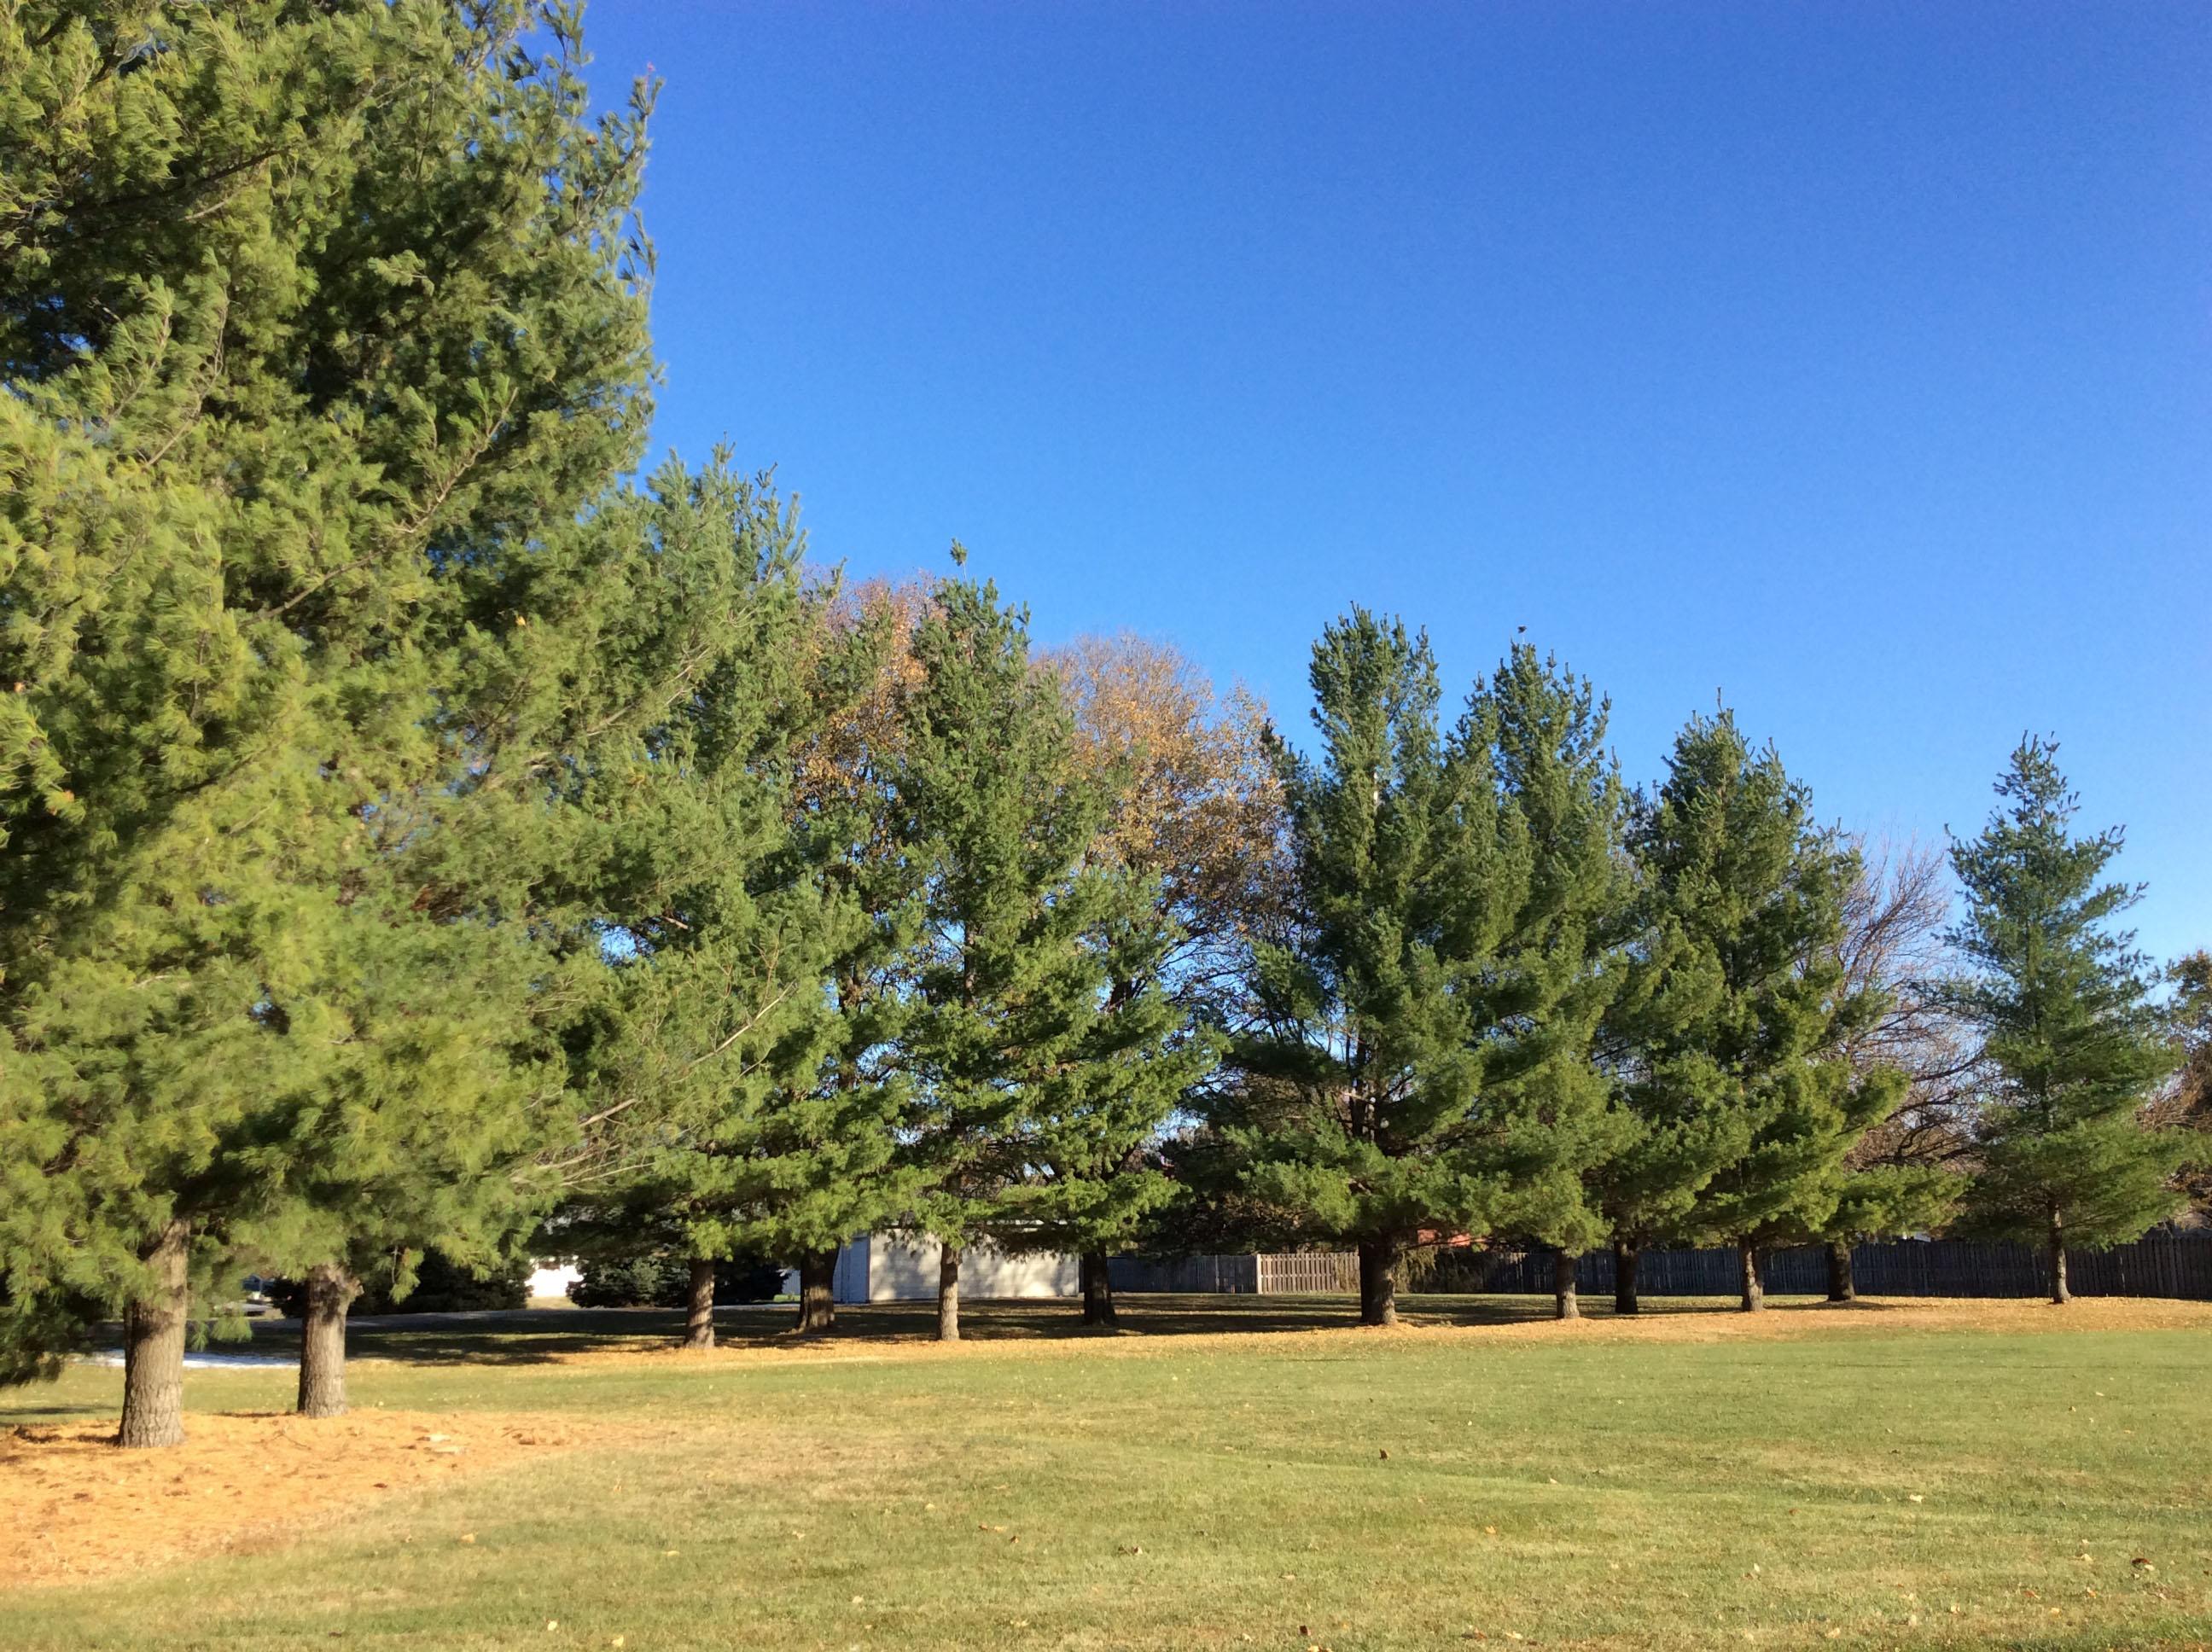 Eastern white pine in an urban windbreak. Windbreak Design & Management, 12/2020